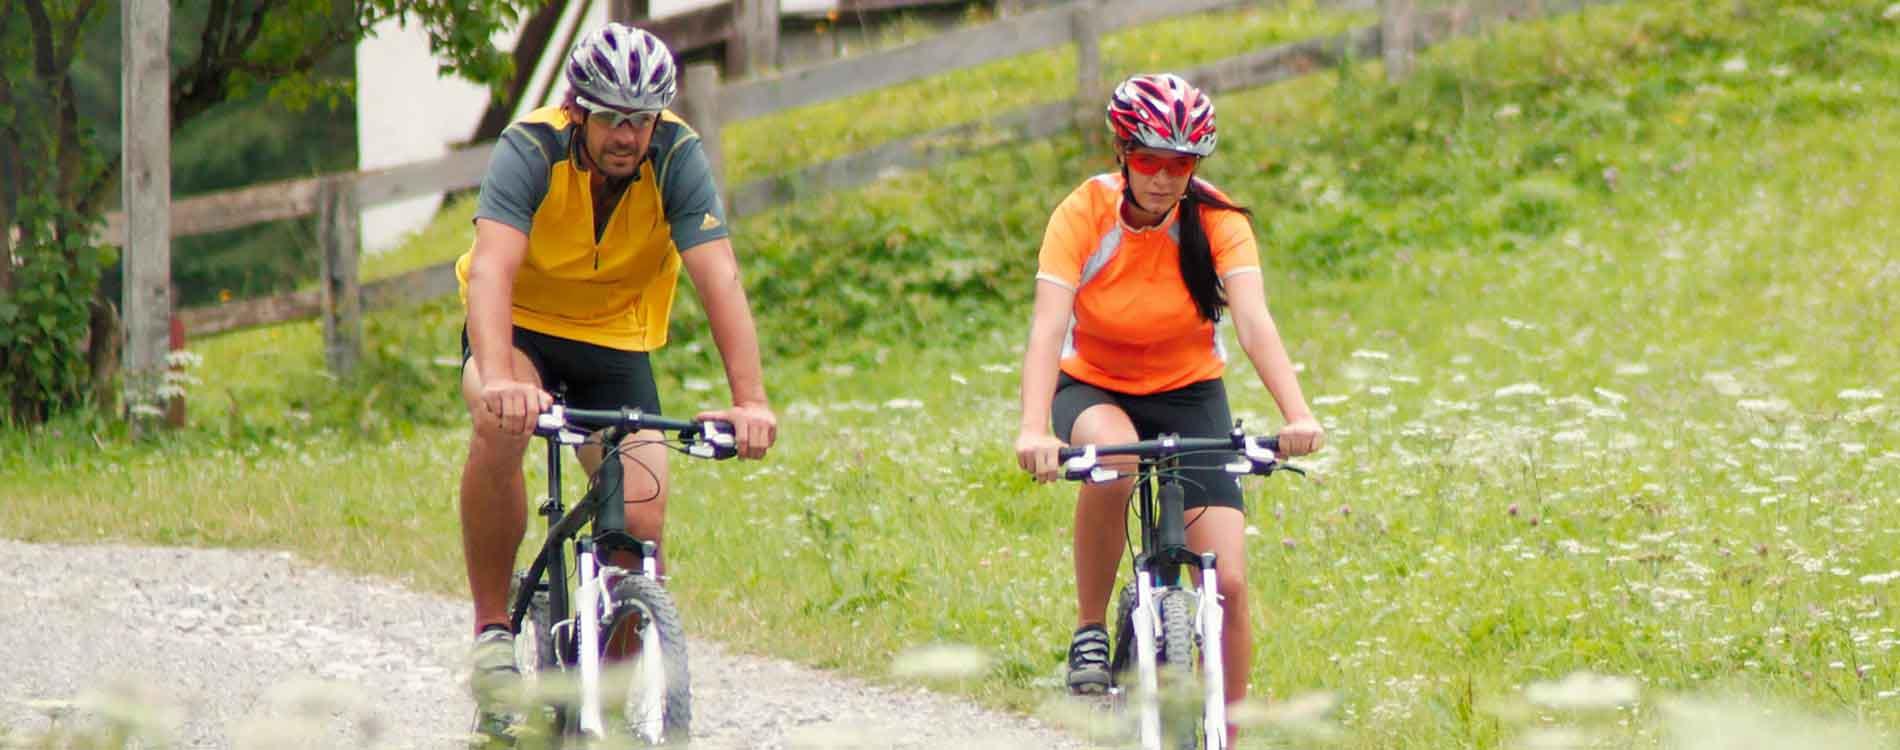 Discover Ehrwald on two wheels @Hotel Tirolerhof 4 Stars Ehrwald Zugspitz Arena Tyrol Austria